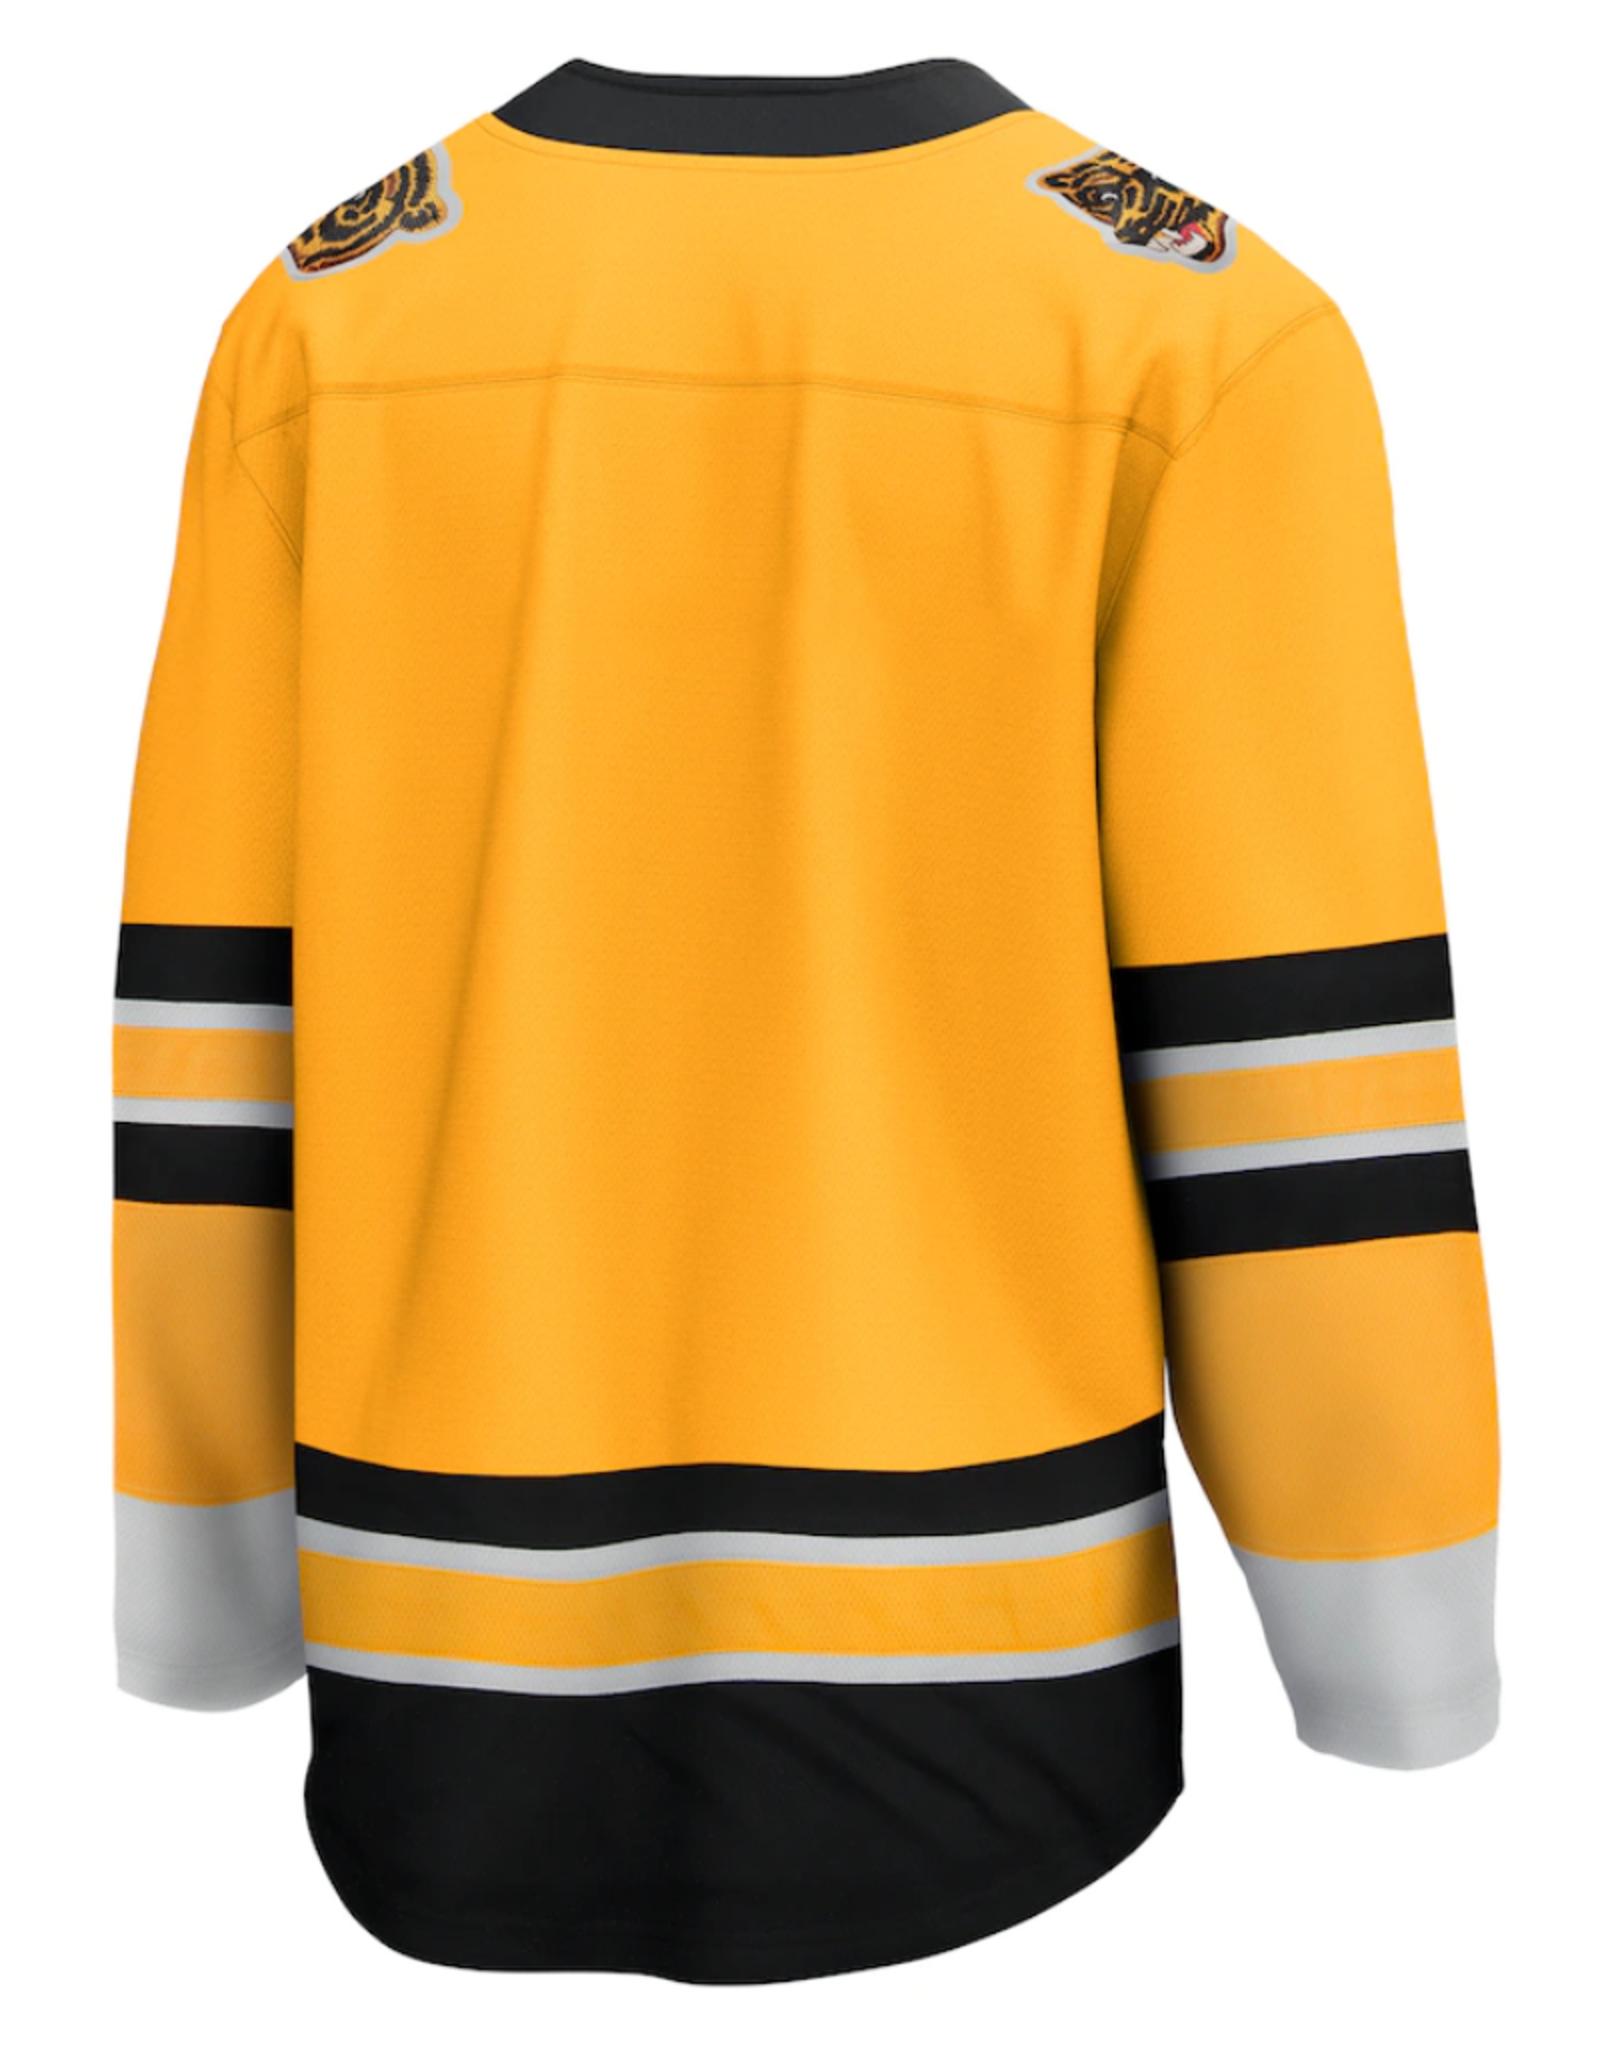 Fanatics Fanatics Men's Breakaway Retro Reverse Jersey Boston Bruins